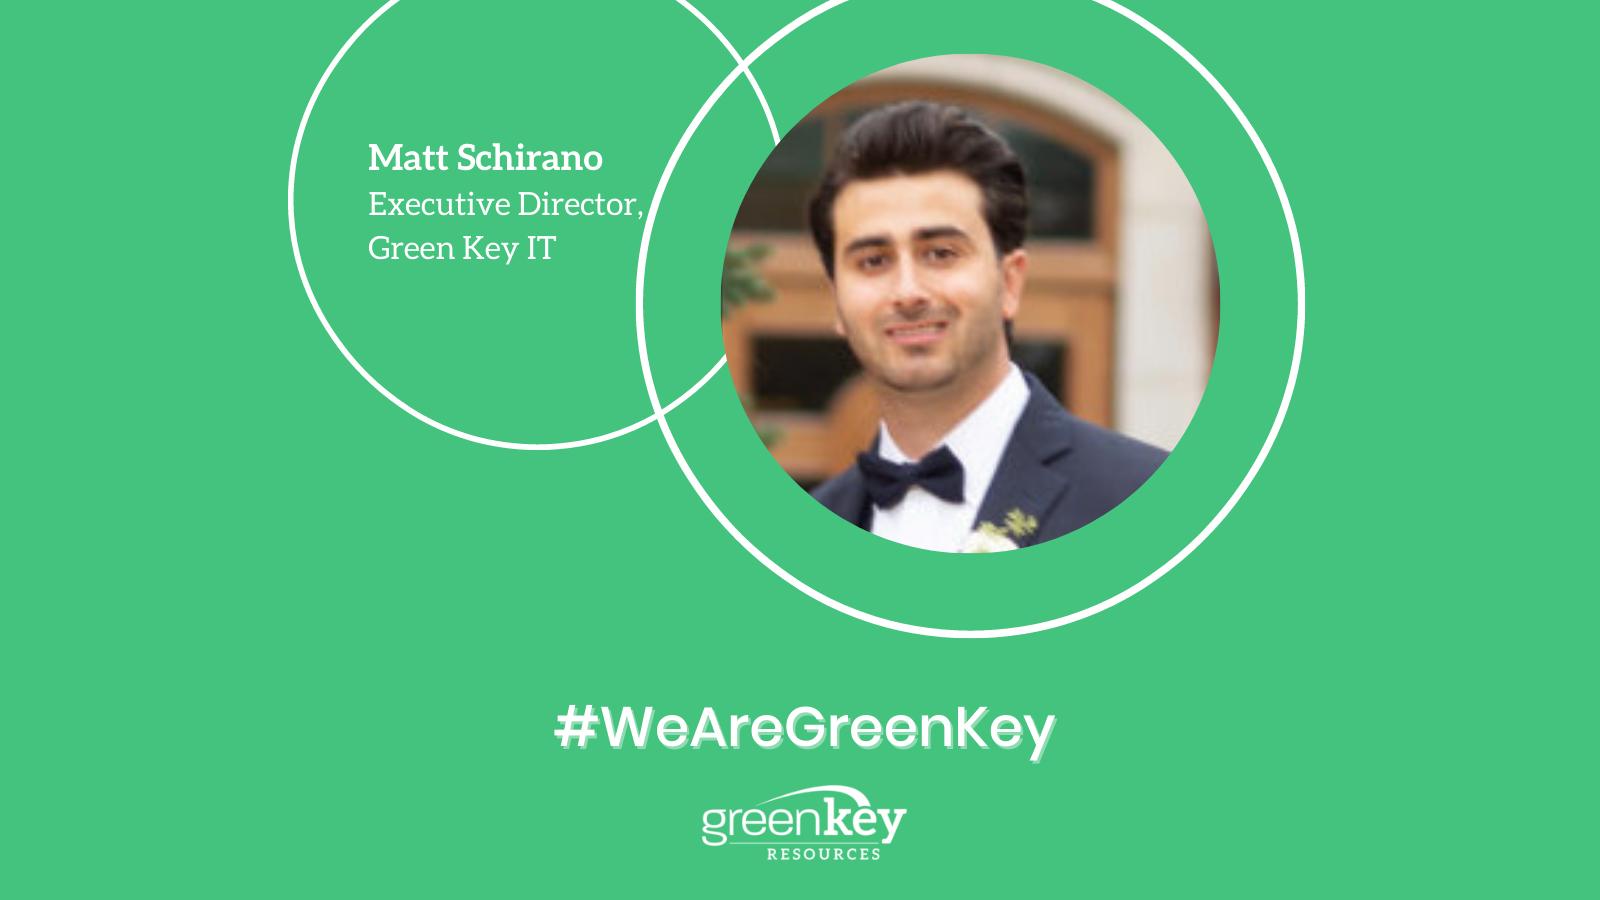 Matt Schirano - Executive Director - Green Key IT